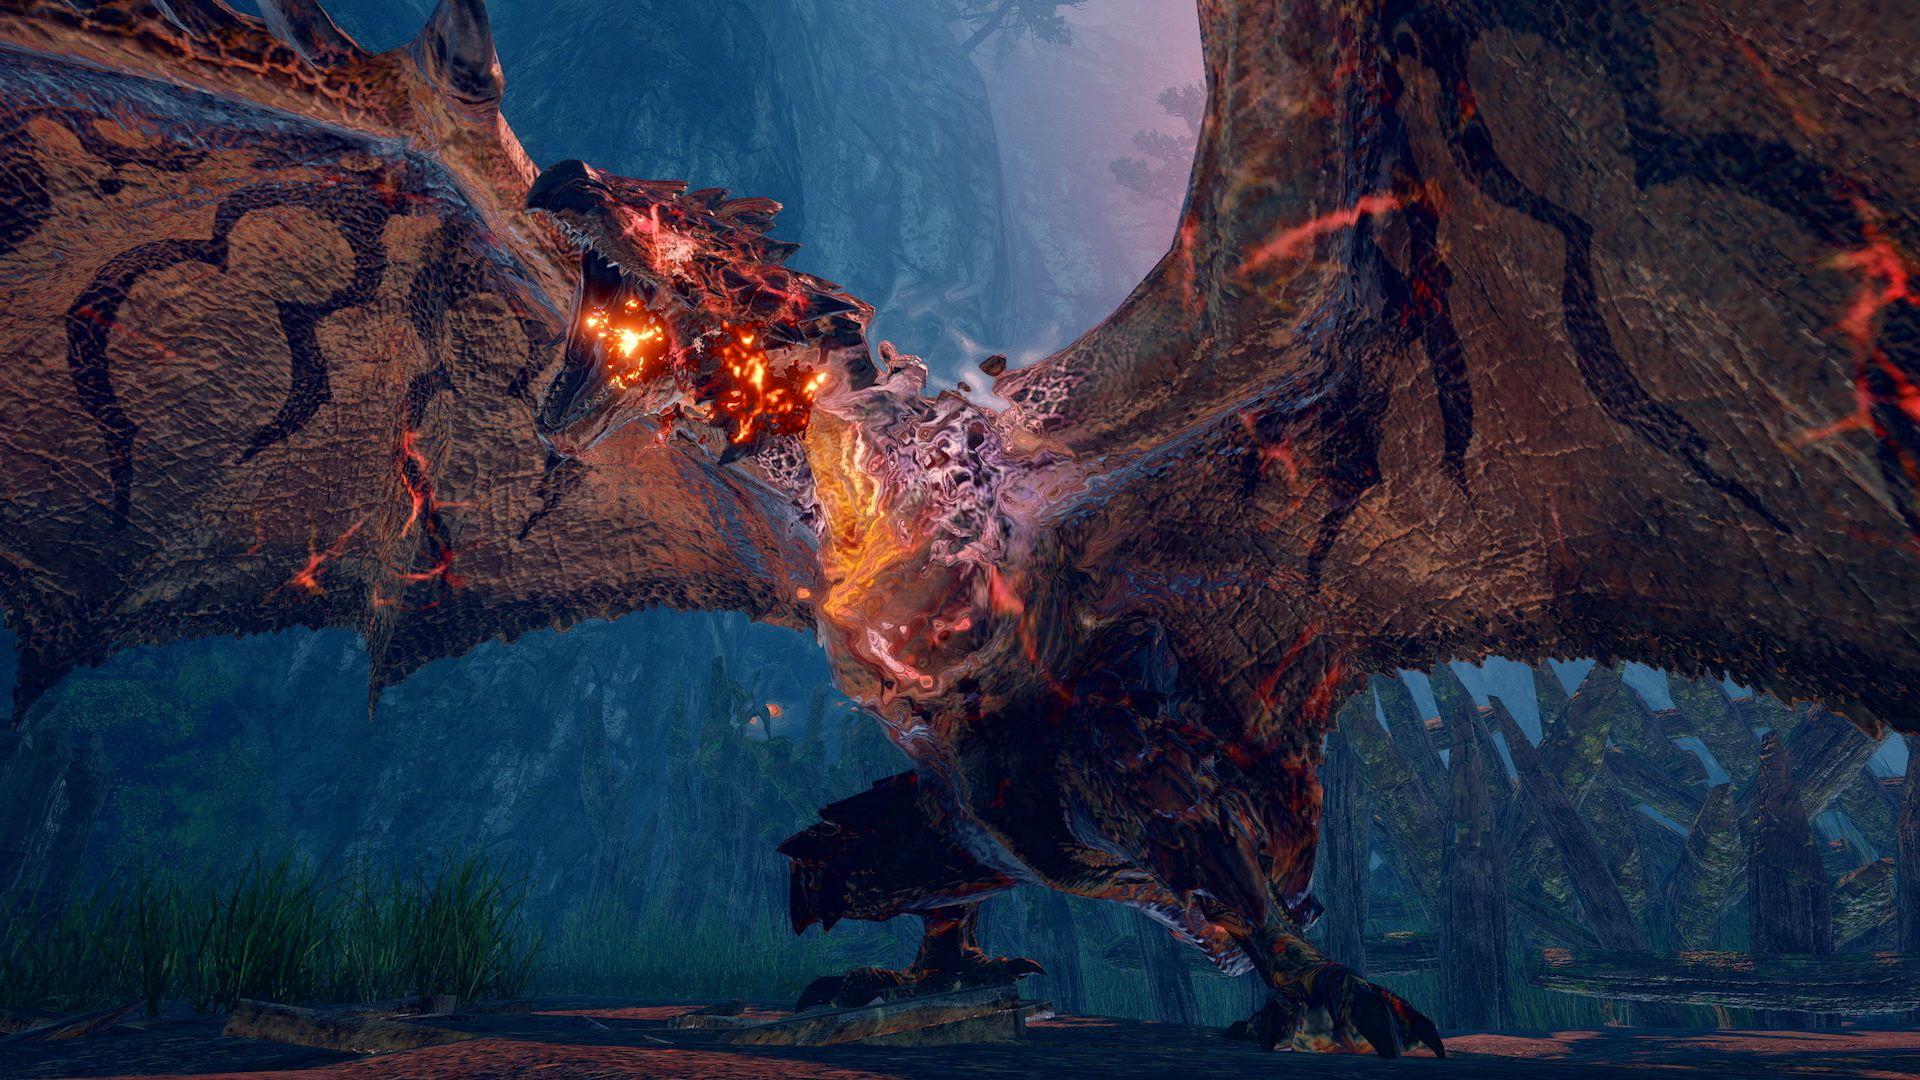 آمار فروش بازی Monster Hunter Rise